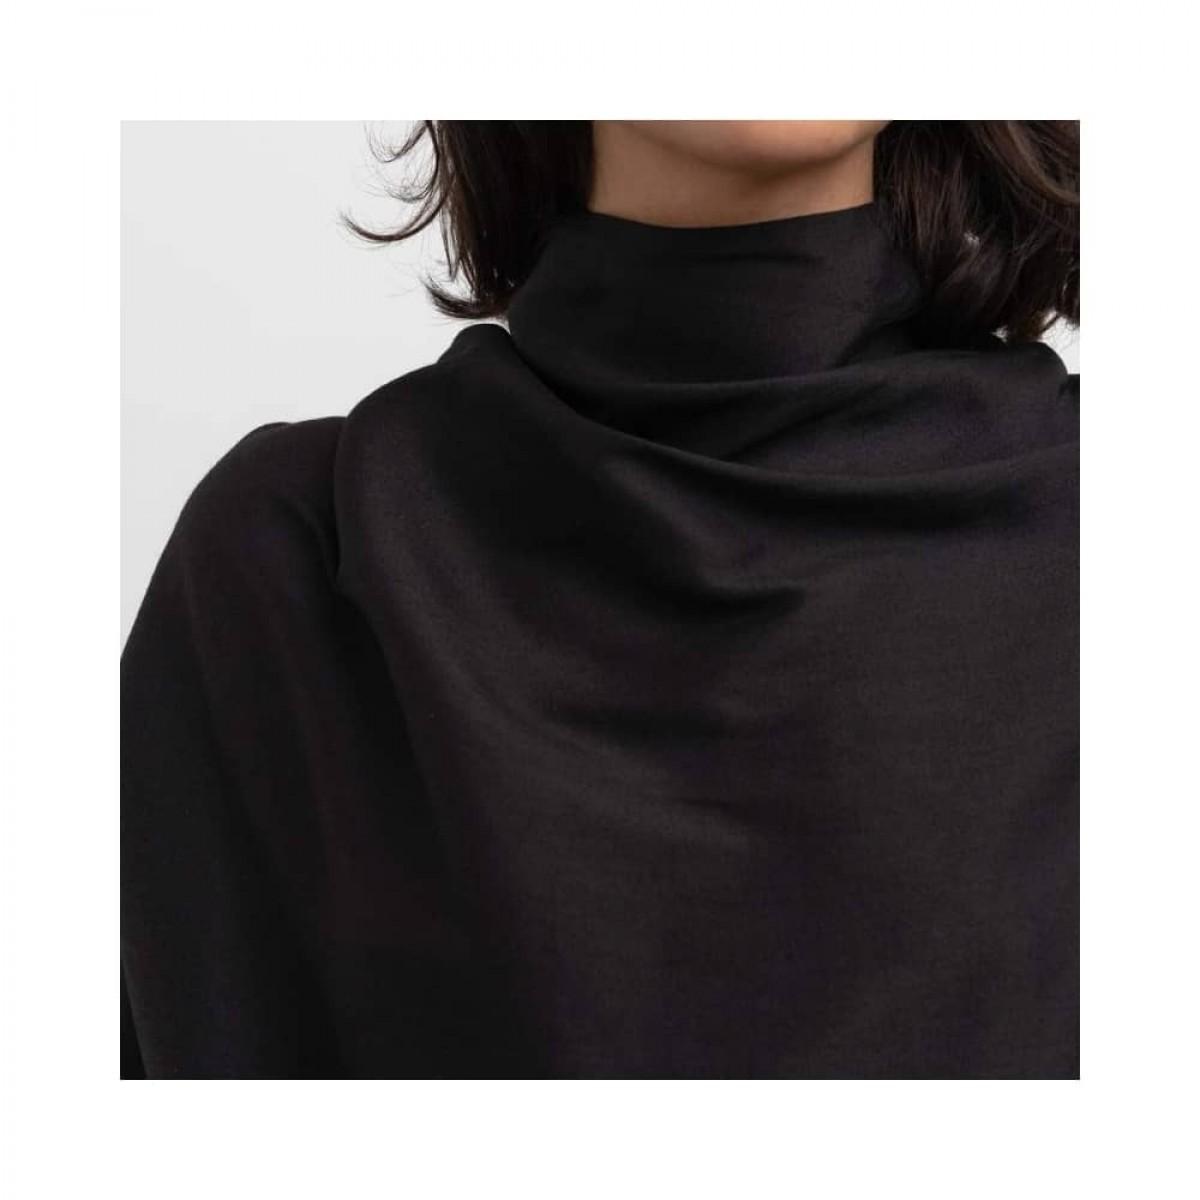 bella wool blouse - black - model hals